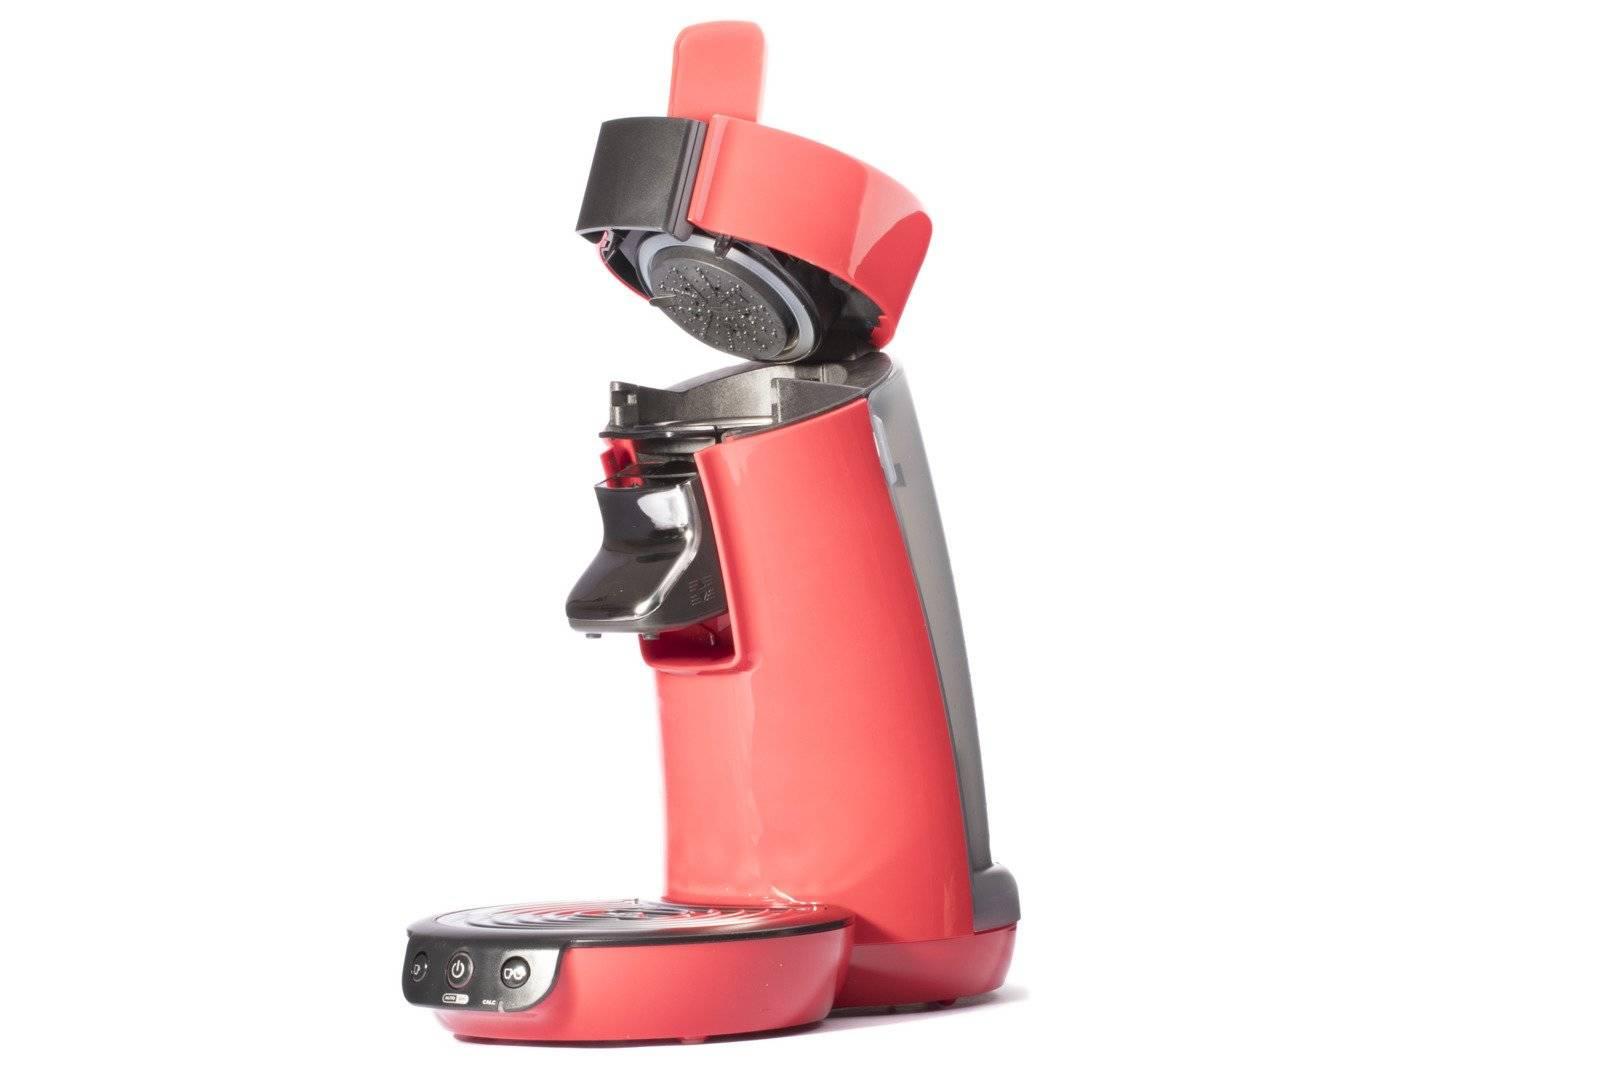 Coffee machine Philips Senseo HD 7829 Damaged